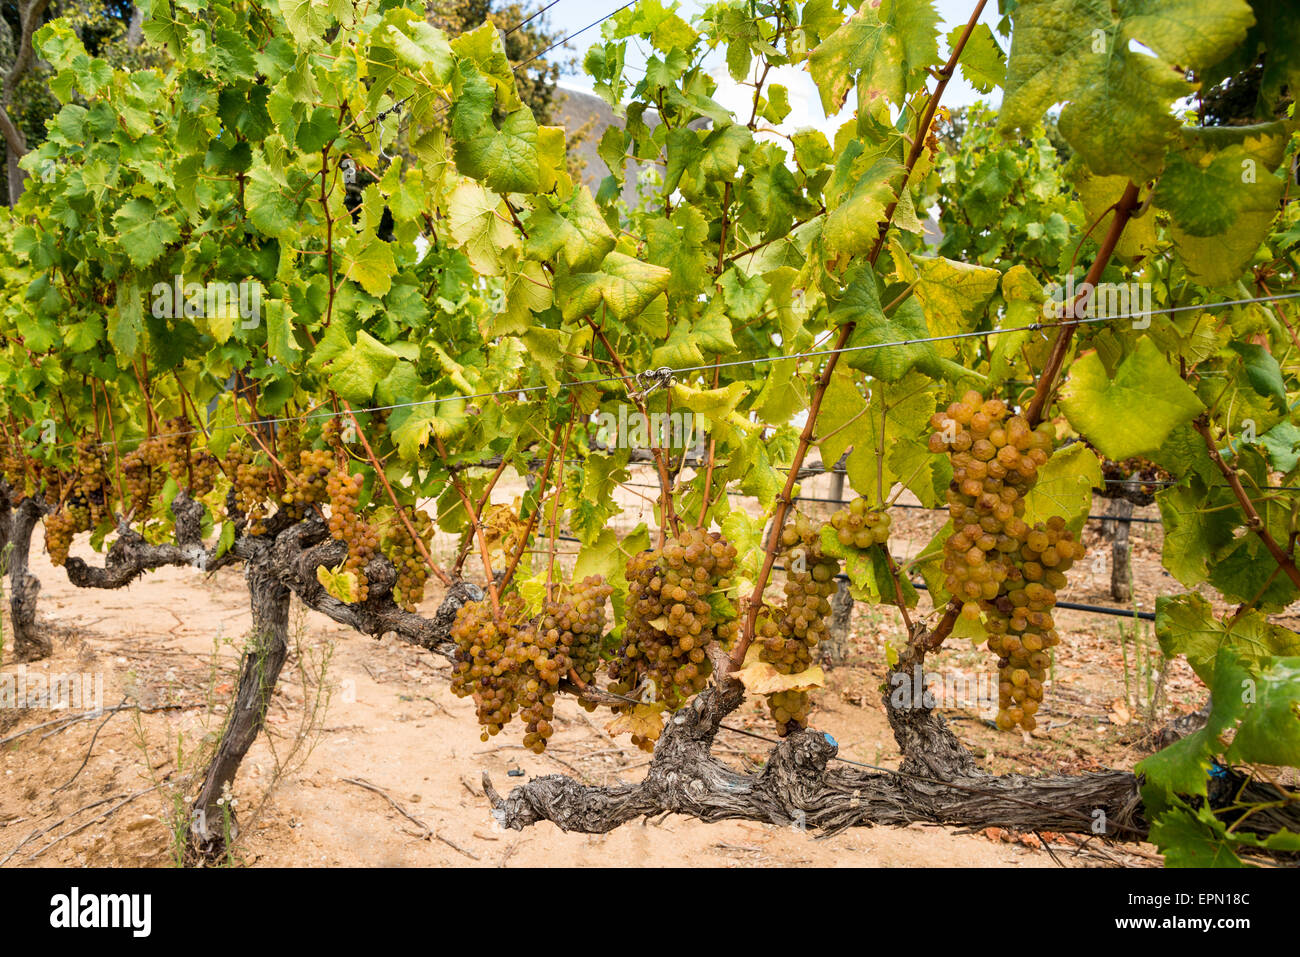 Grape vines, Groot Constantia Wine Estate, Constantia, Cape Town, Western Cape Province, Republic of South Africa - Stock Image